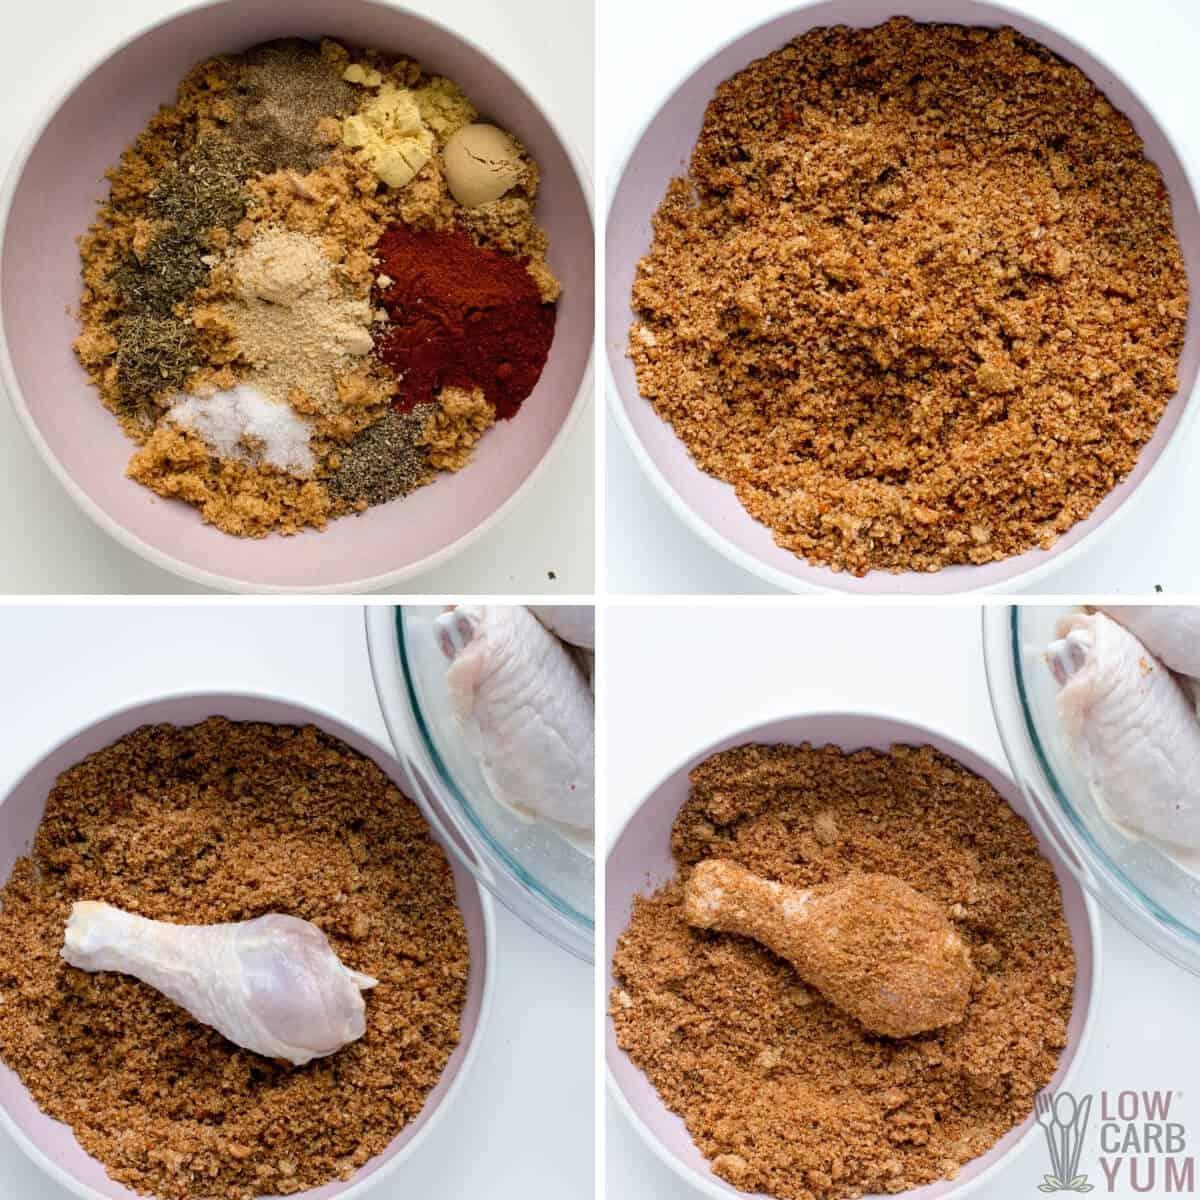 Dipping chicken in keto fried chicken pork rind coating